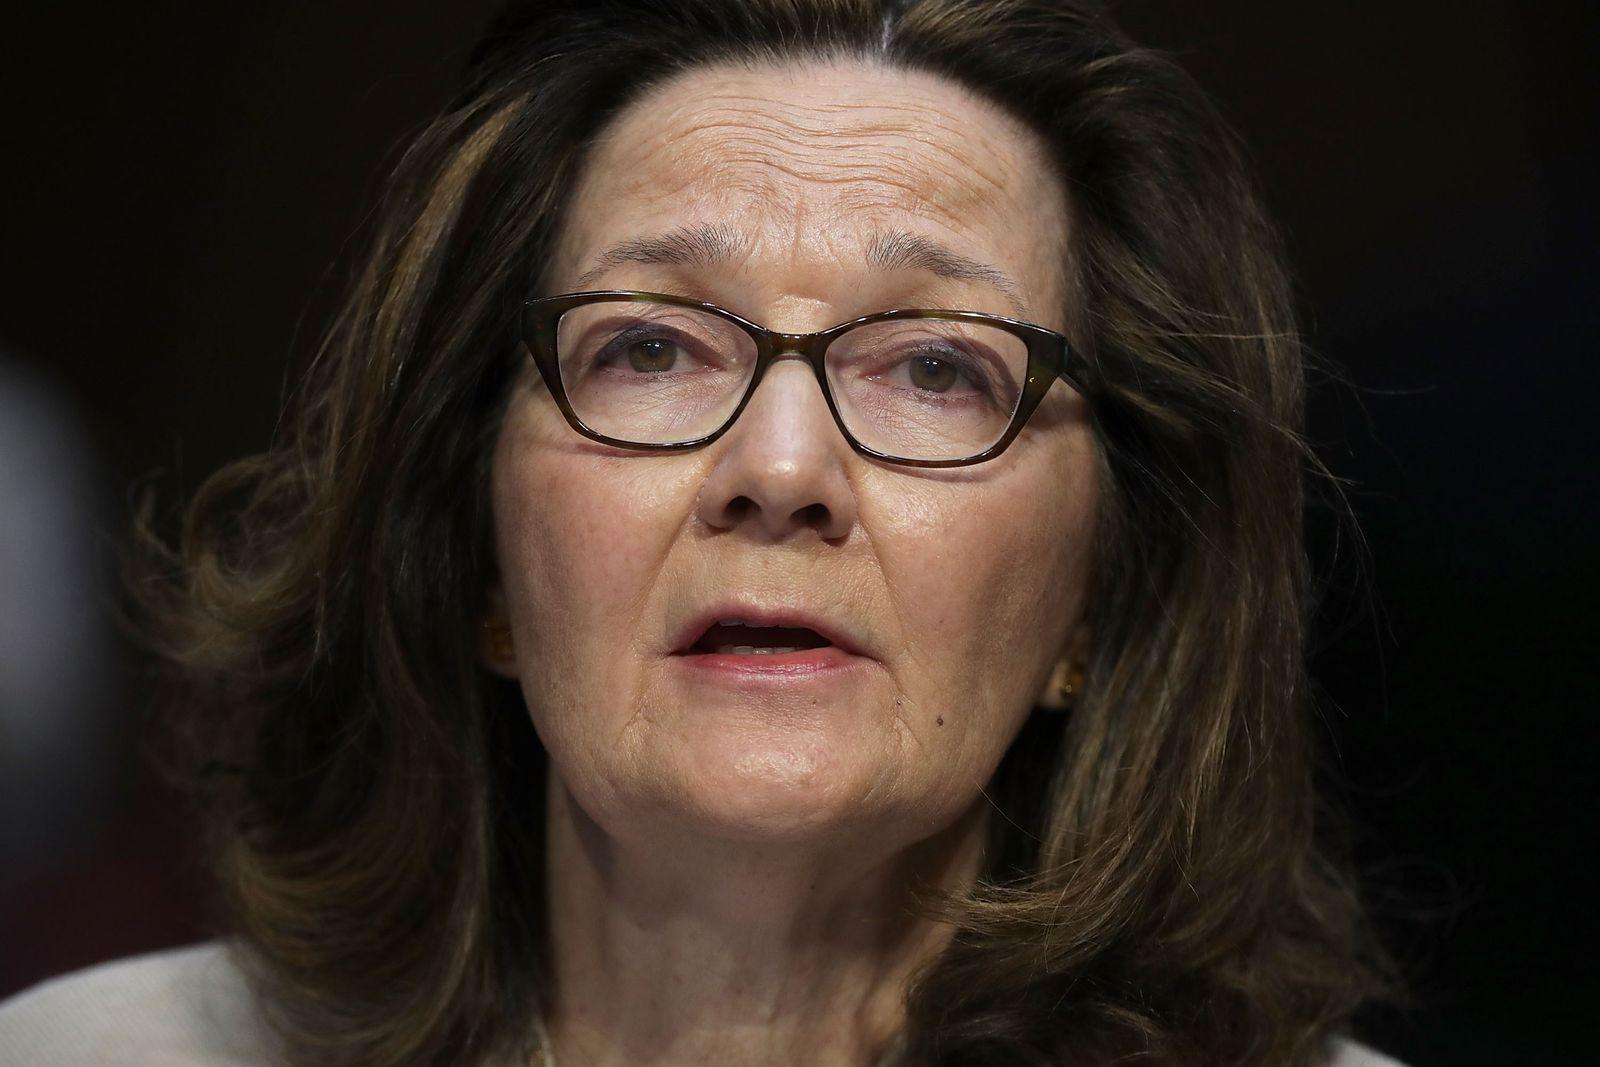 US-CIA-DIRECTOR-NOMINEE-GINA-HASPEL-TESTIFIES-AT-SENATE-CONFIRMA